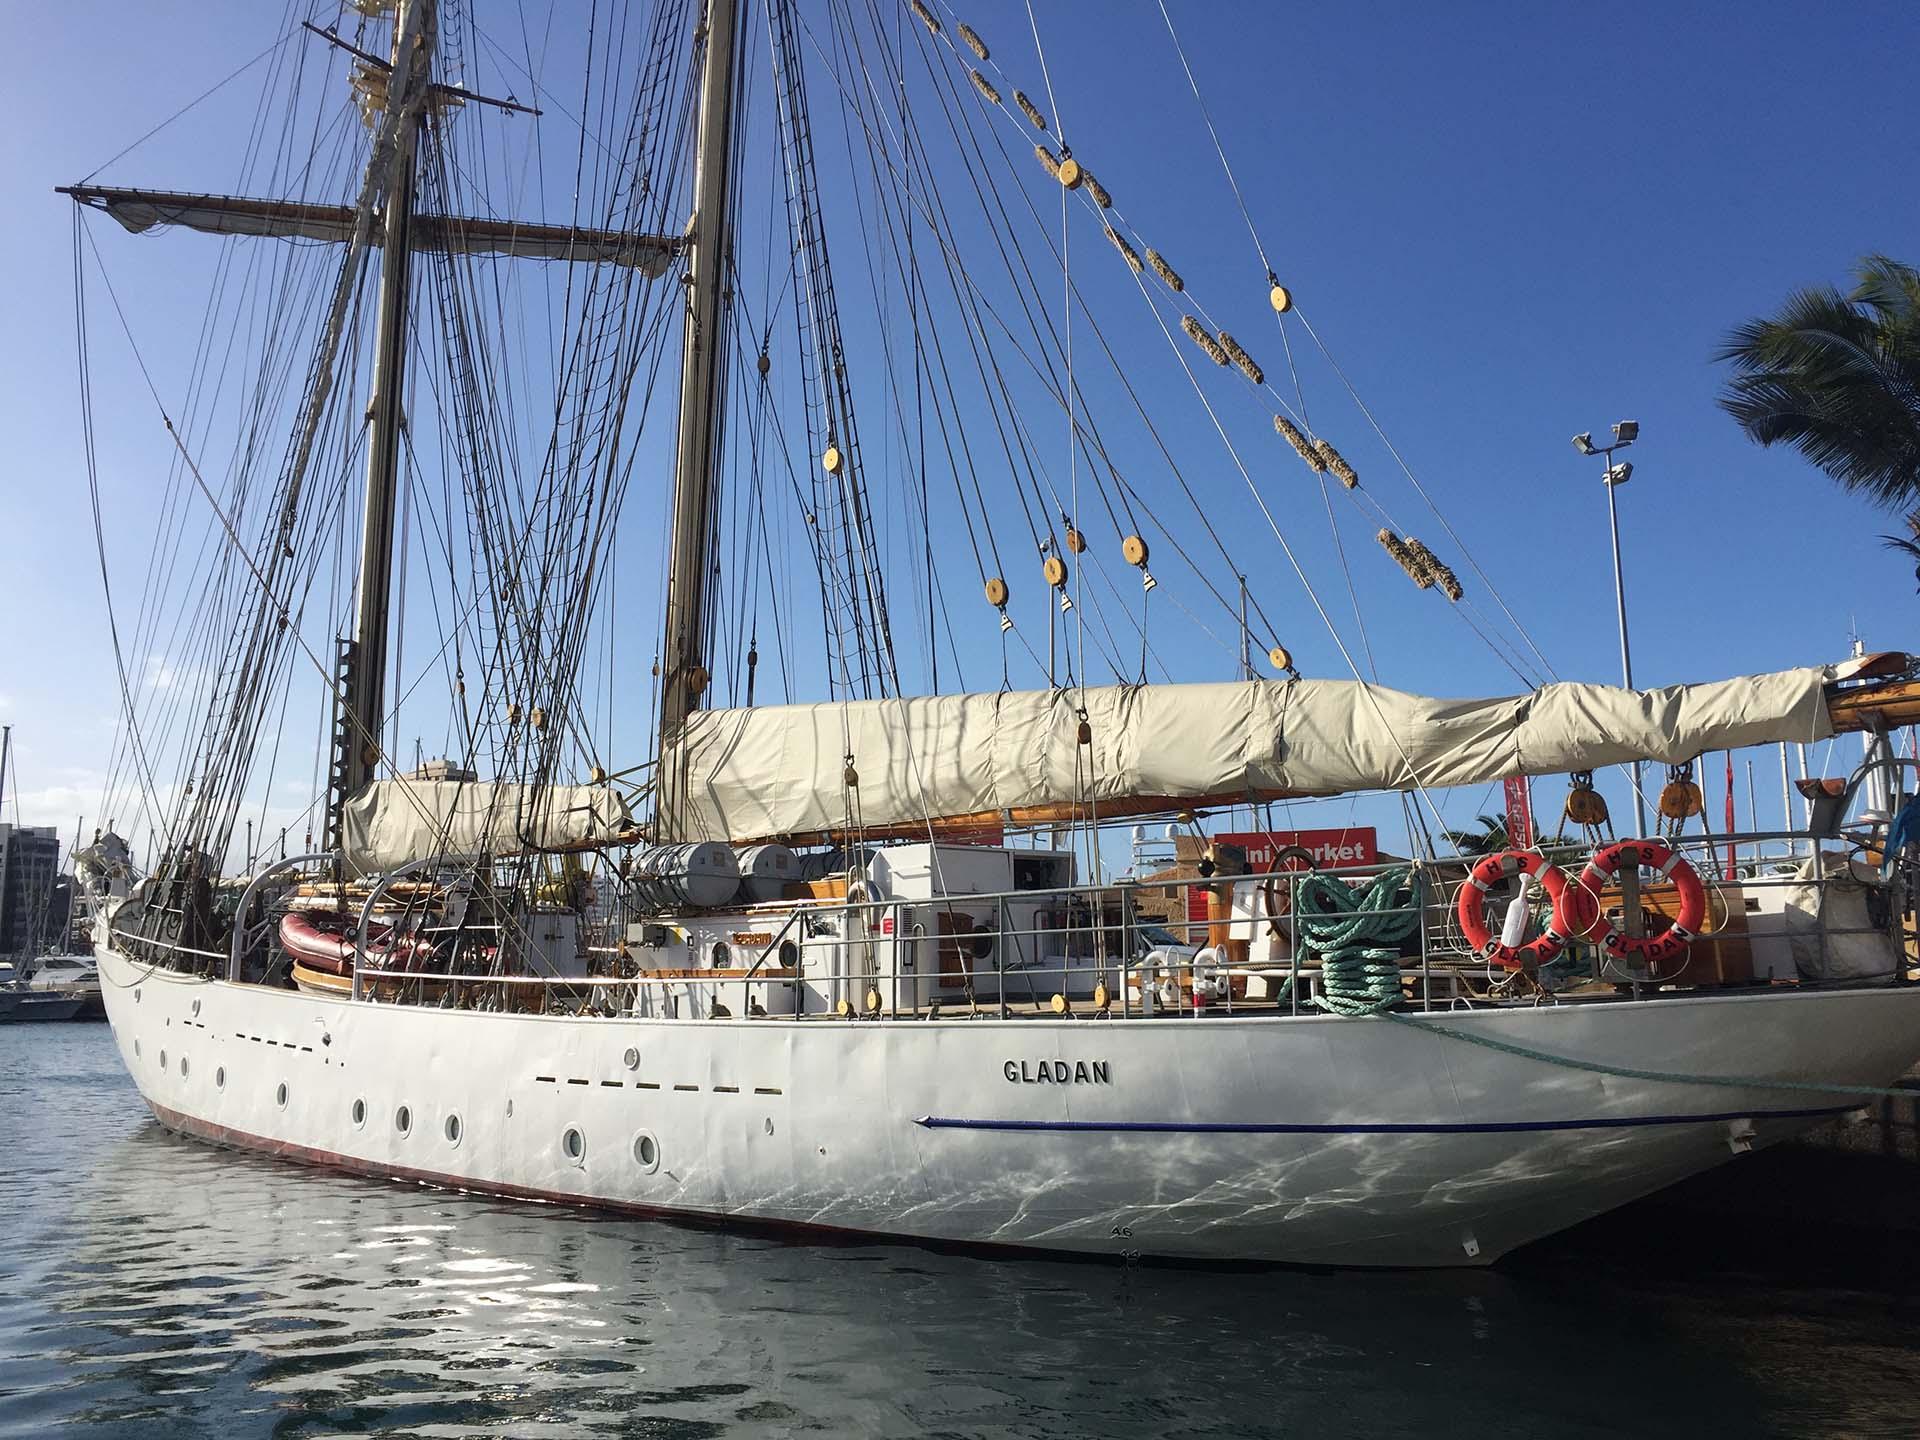 Niklas Amundson HMS Gladan